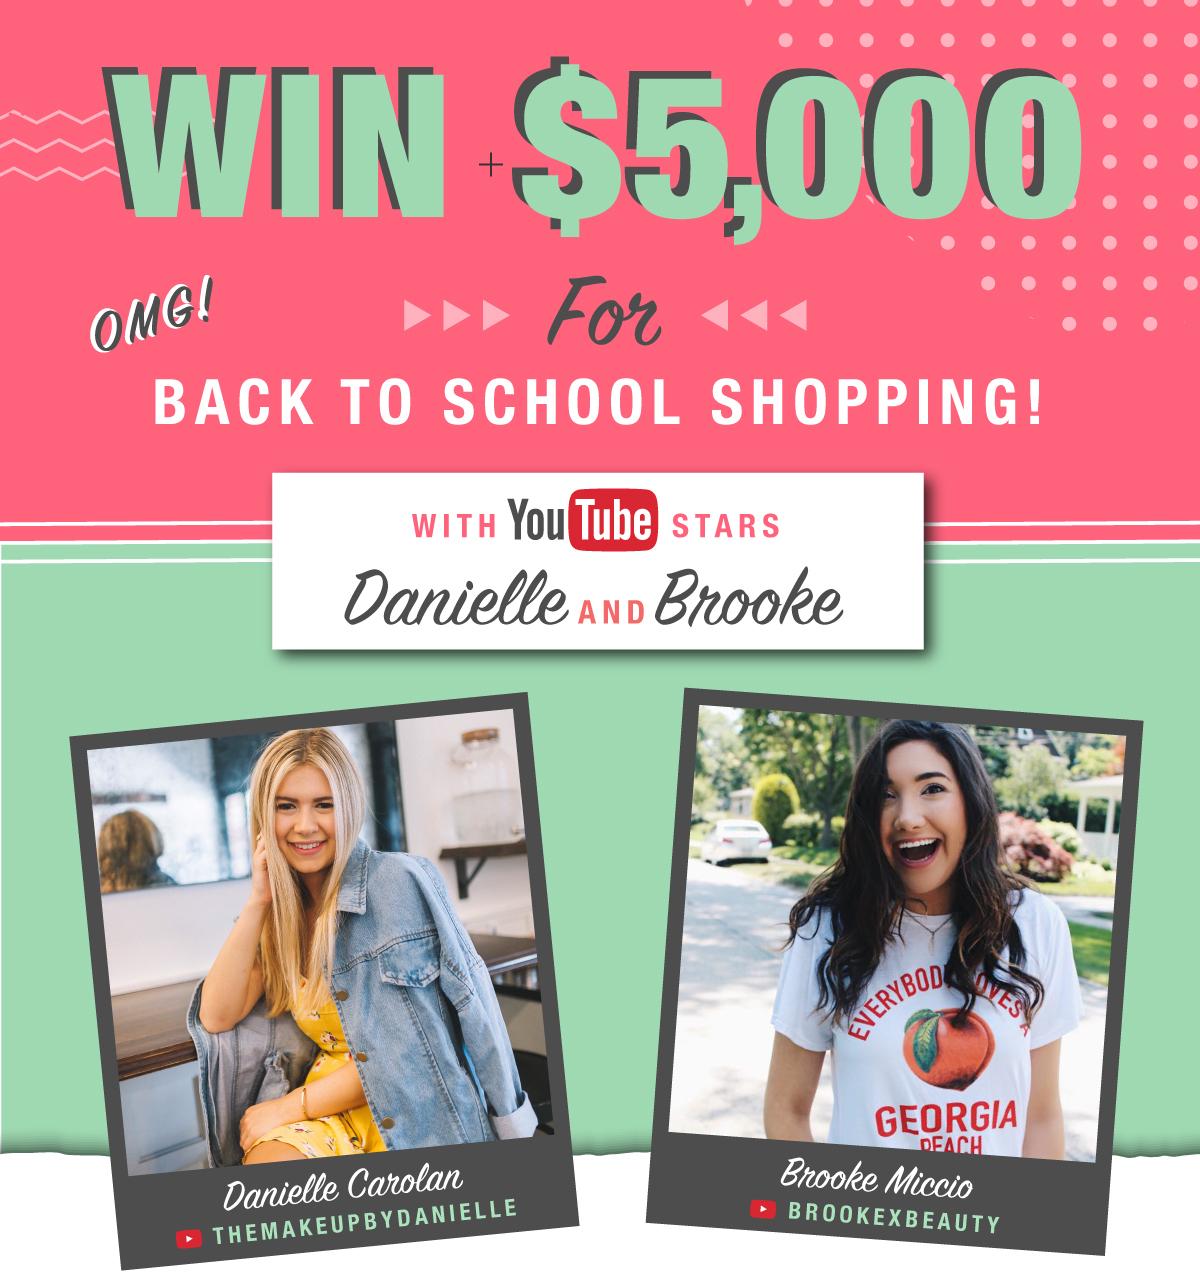 Jacksonville Mall 5000 Back To School Shopping Spree